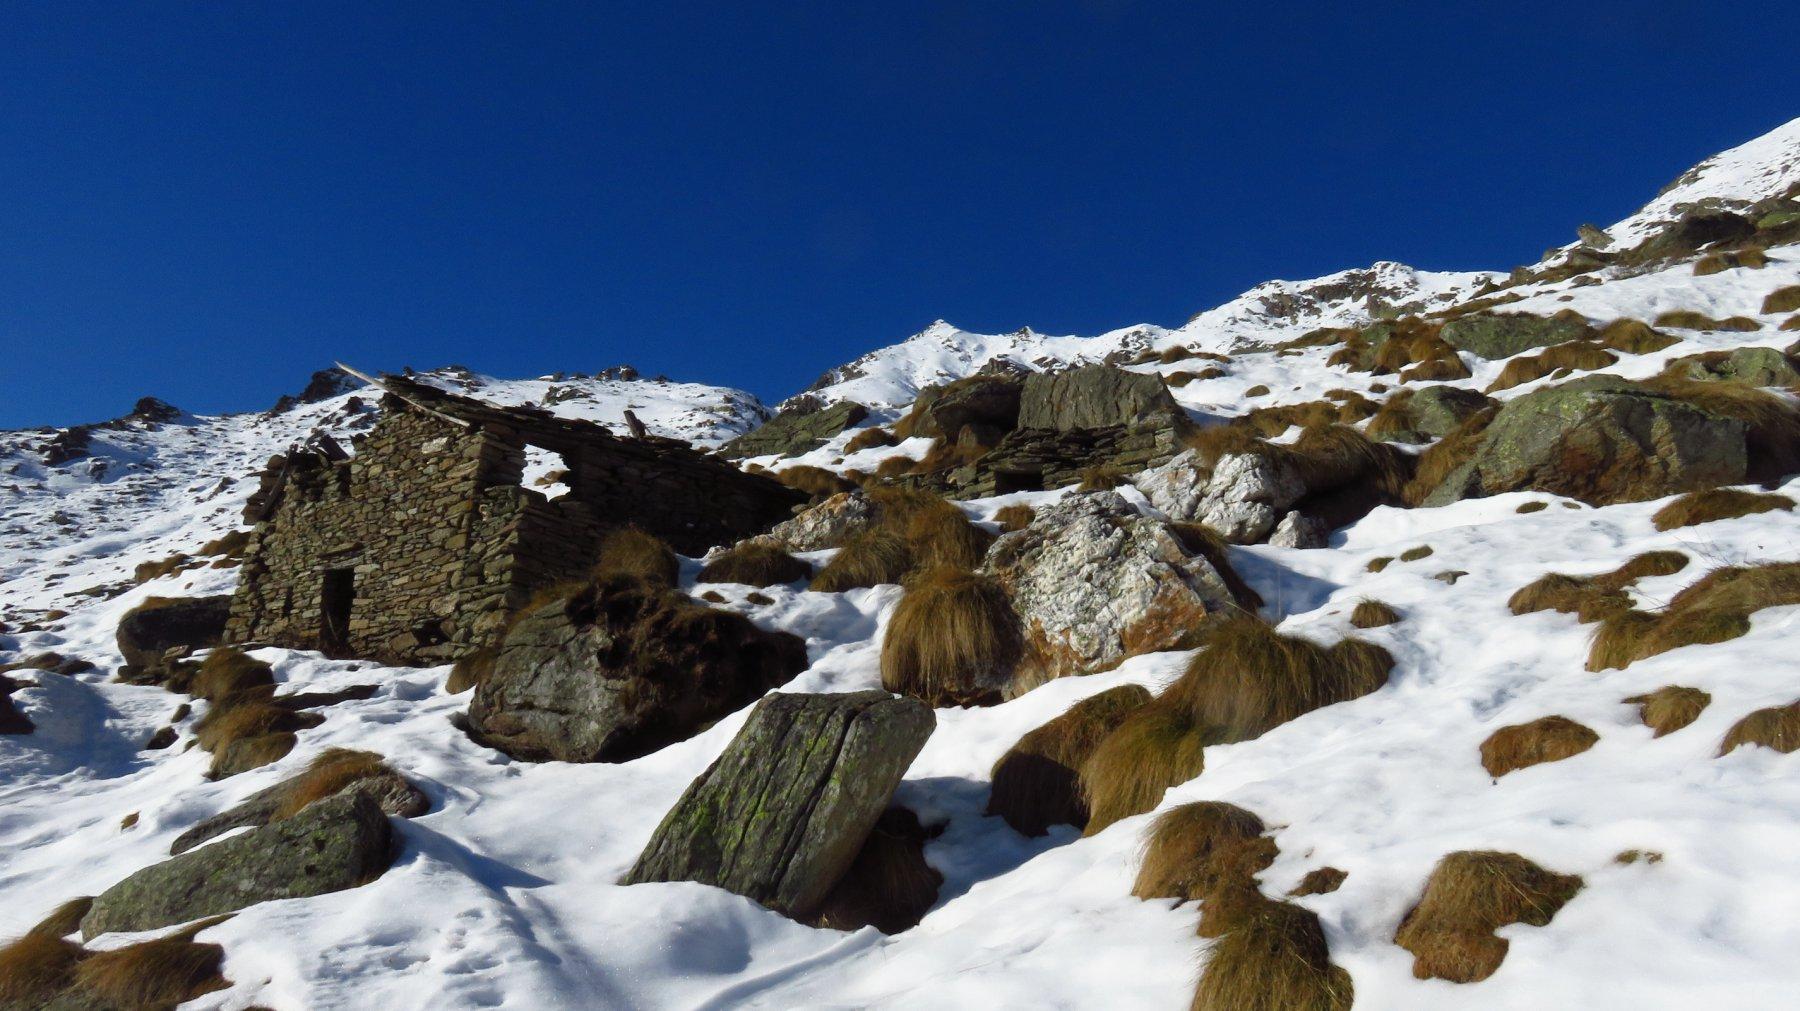 Alpe Roc